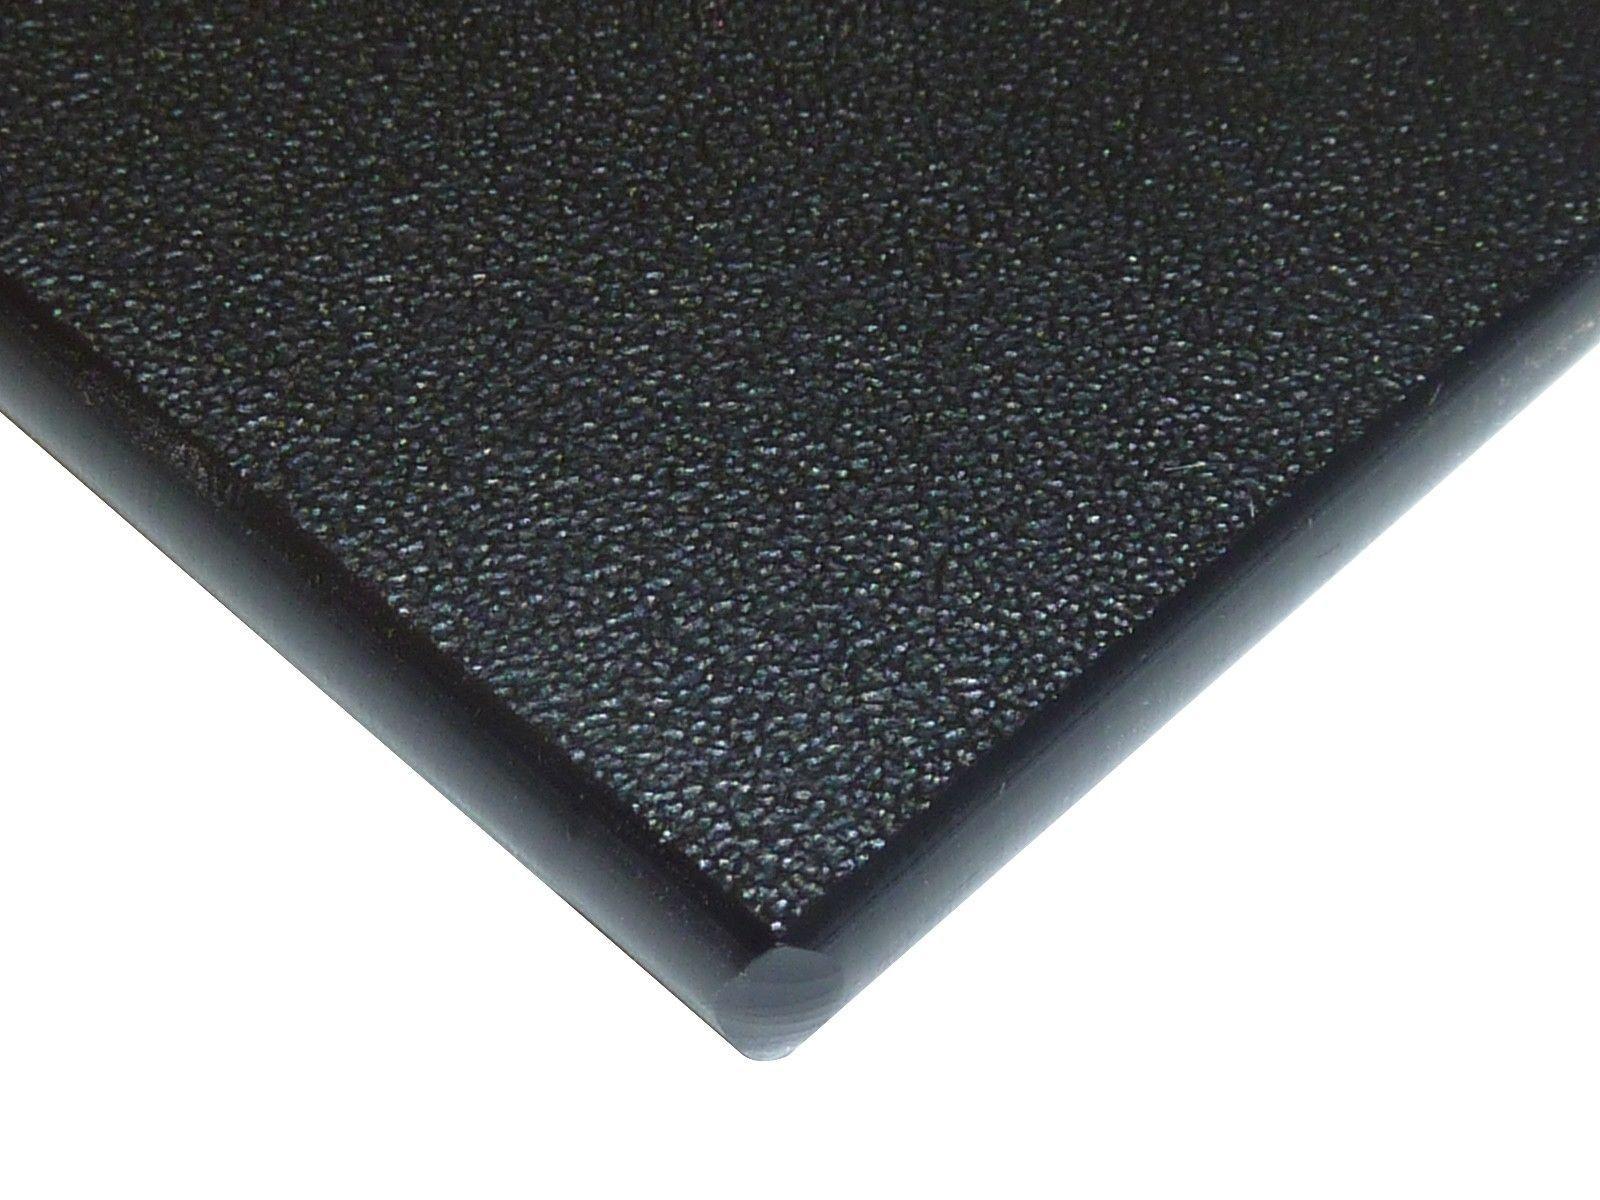 Black Marine Board Hdpe Polyethylene Plastic Sheet 1 4 0 250 Thick Textured Plastic Sheets Polyethylene Texture